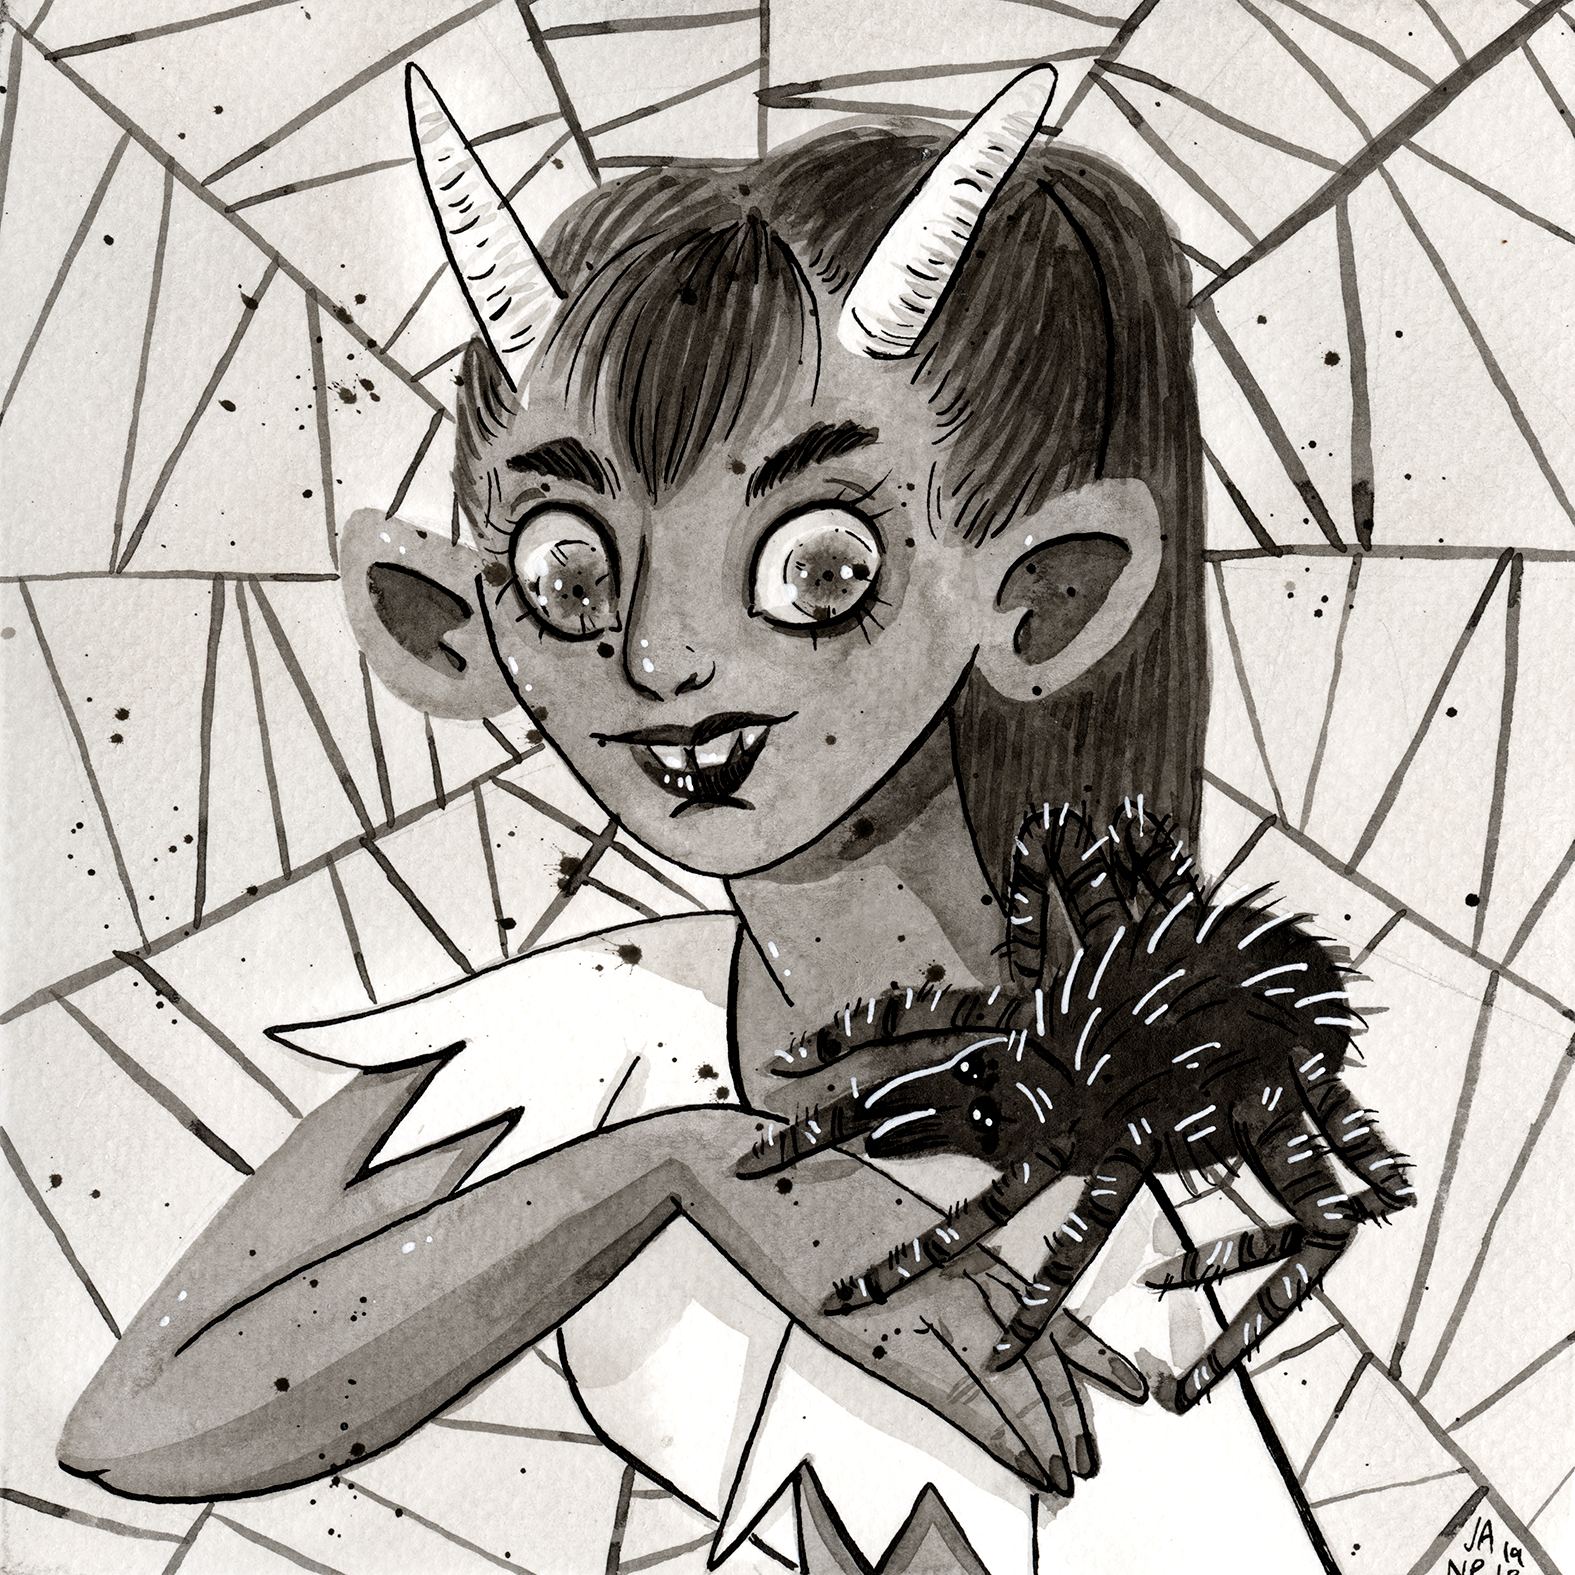 27-Arachnide-Web